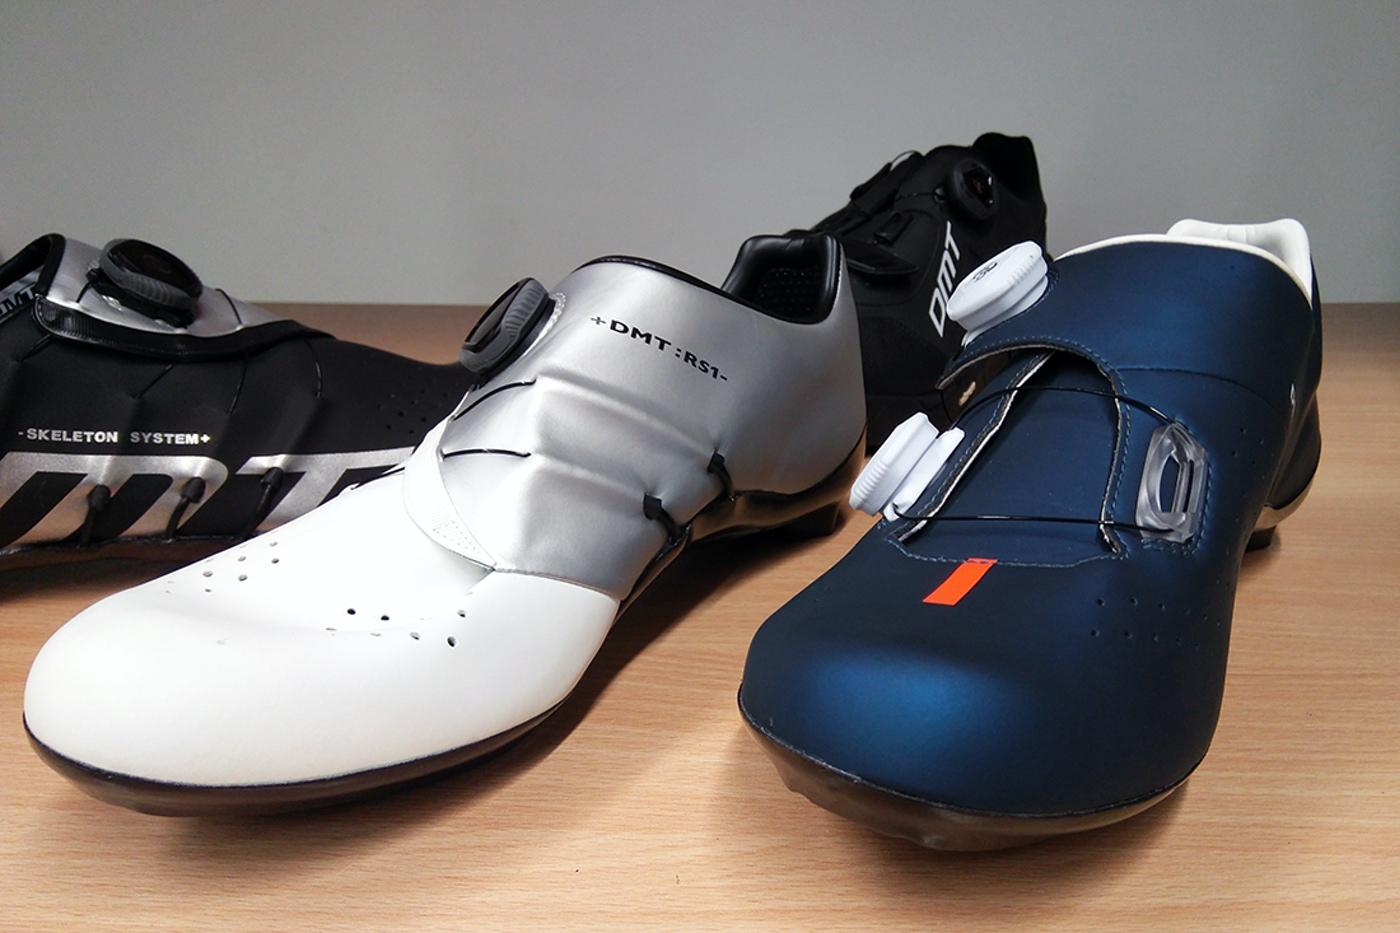 D1, D3, D5... Nuevo catálogo de zapatillas DMT